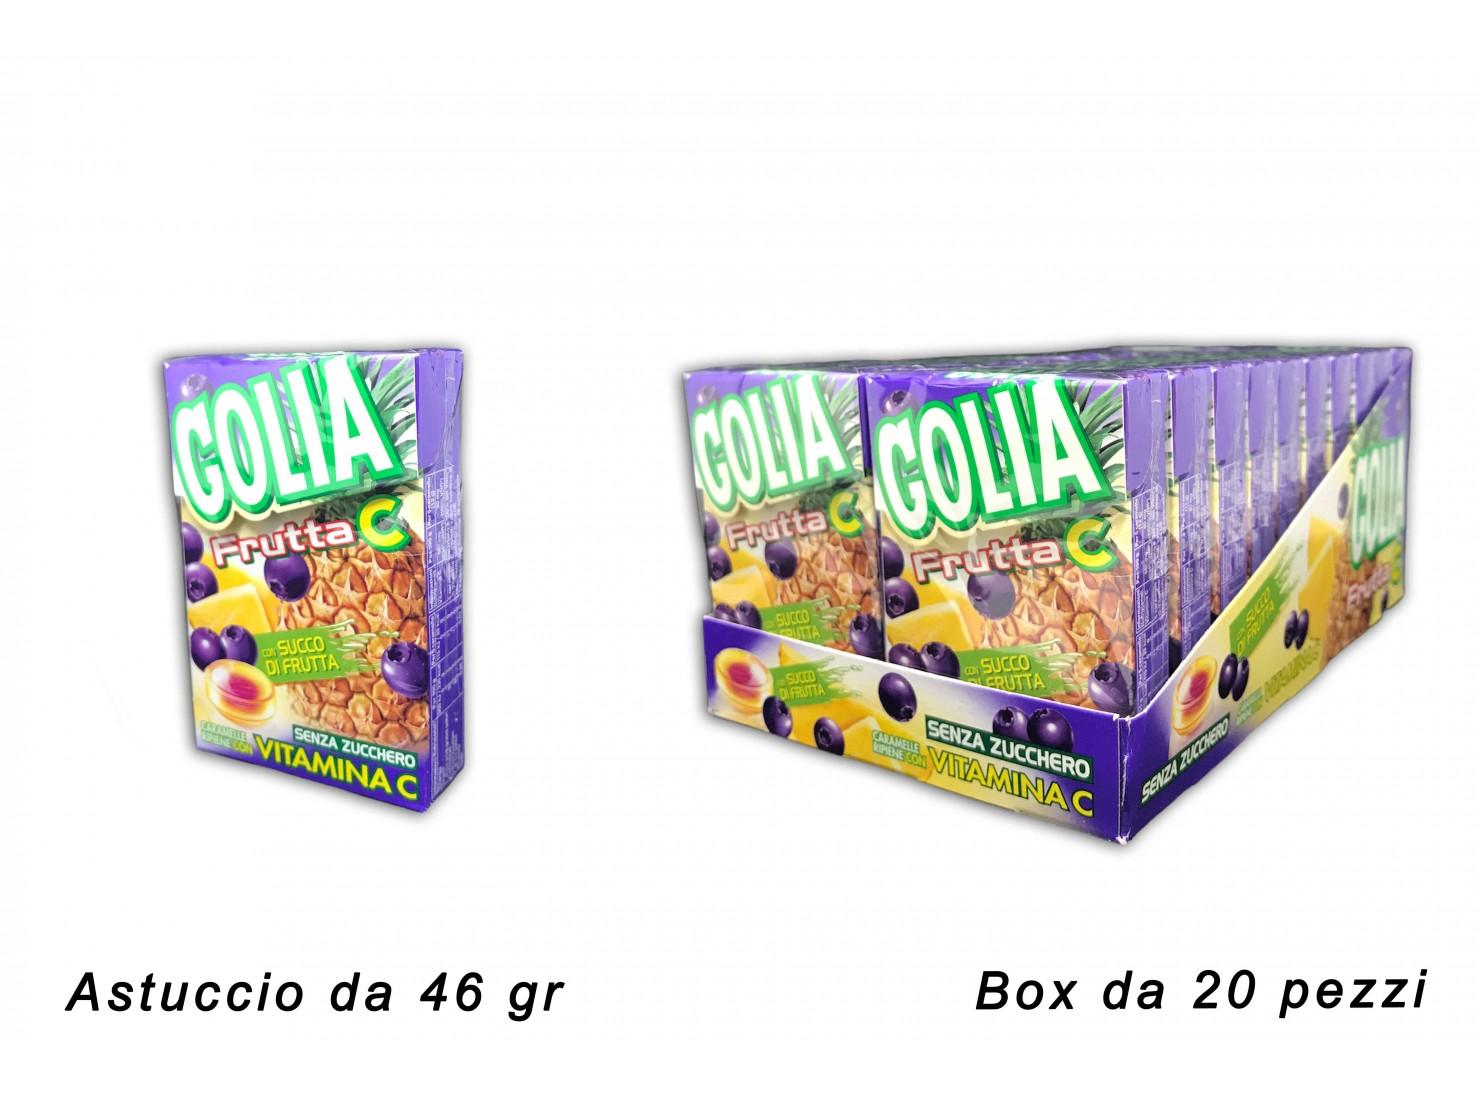 GOLIA FRUTTA C ANANAS...